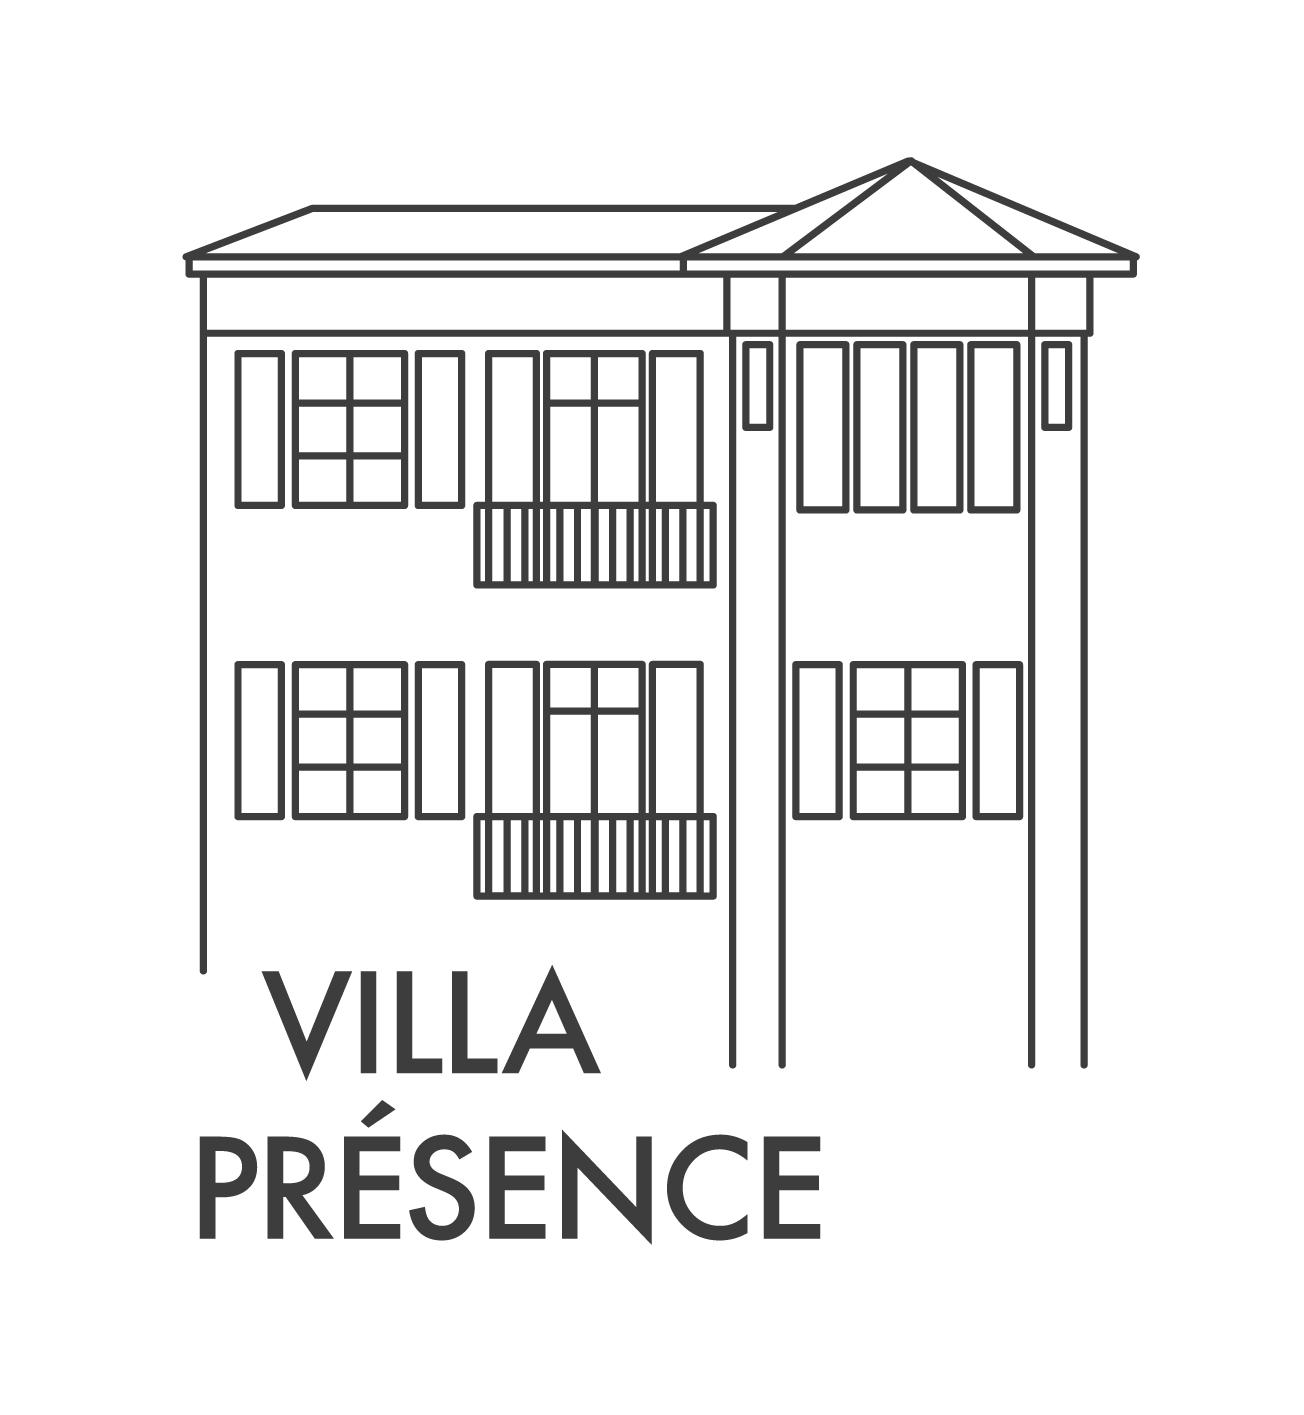 VILLA_PRESENCE_NOIR